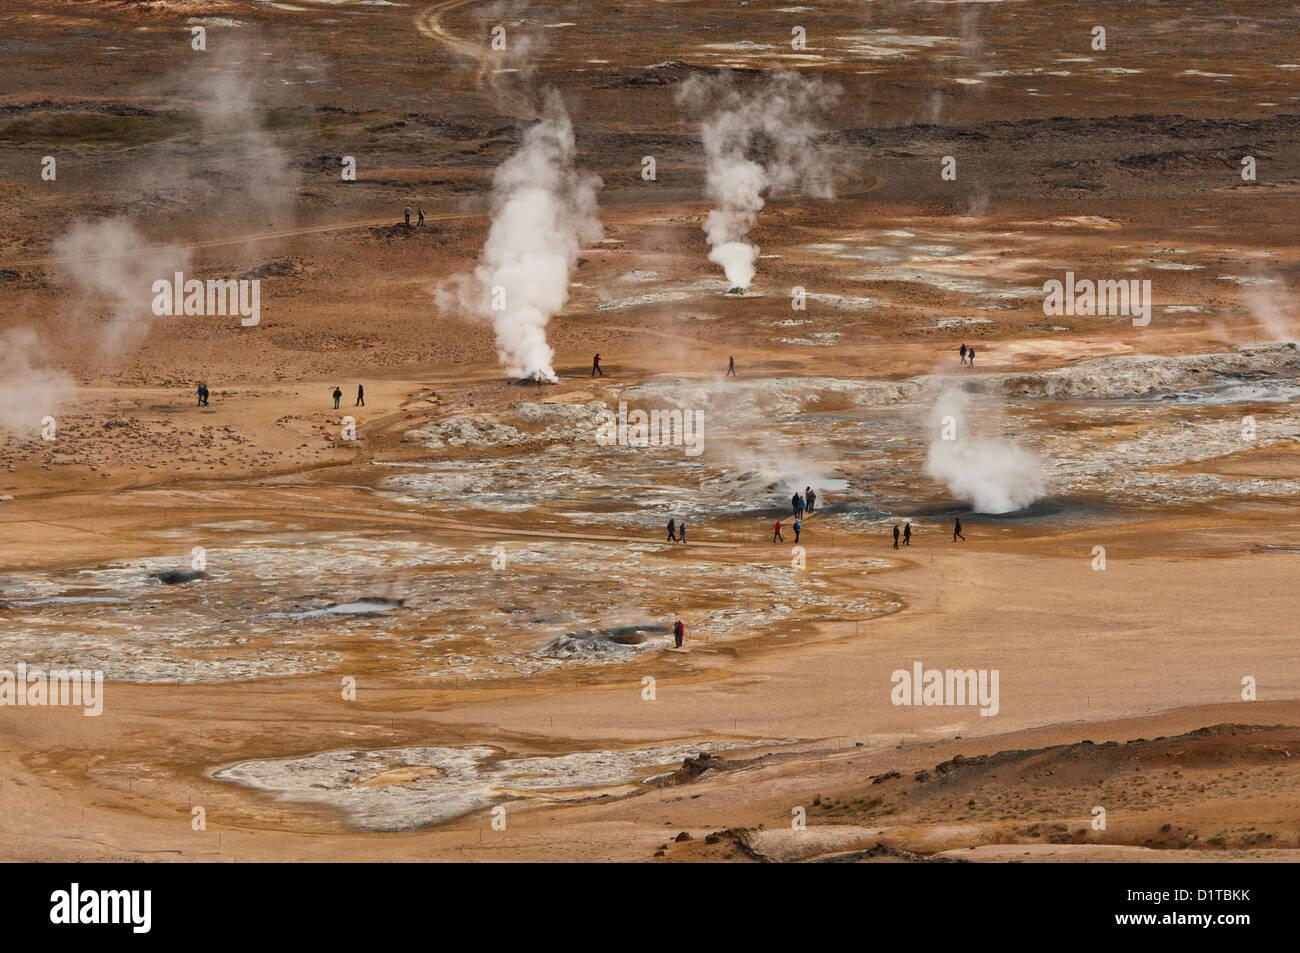 smoking fumaroles at the geothermal area of Hverir near Lake Myvatn, Iceland - Stock Image